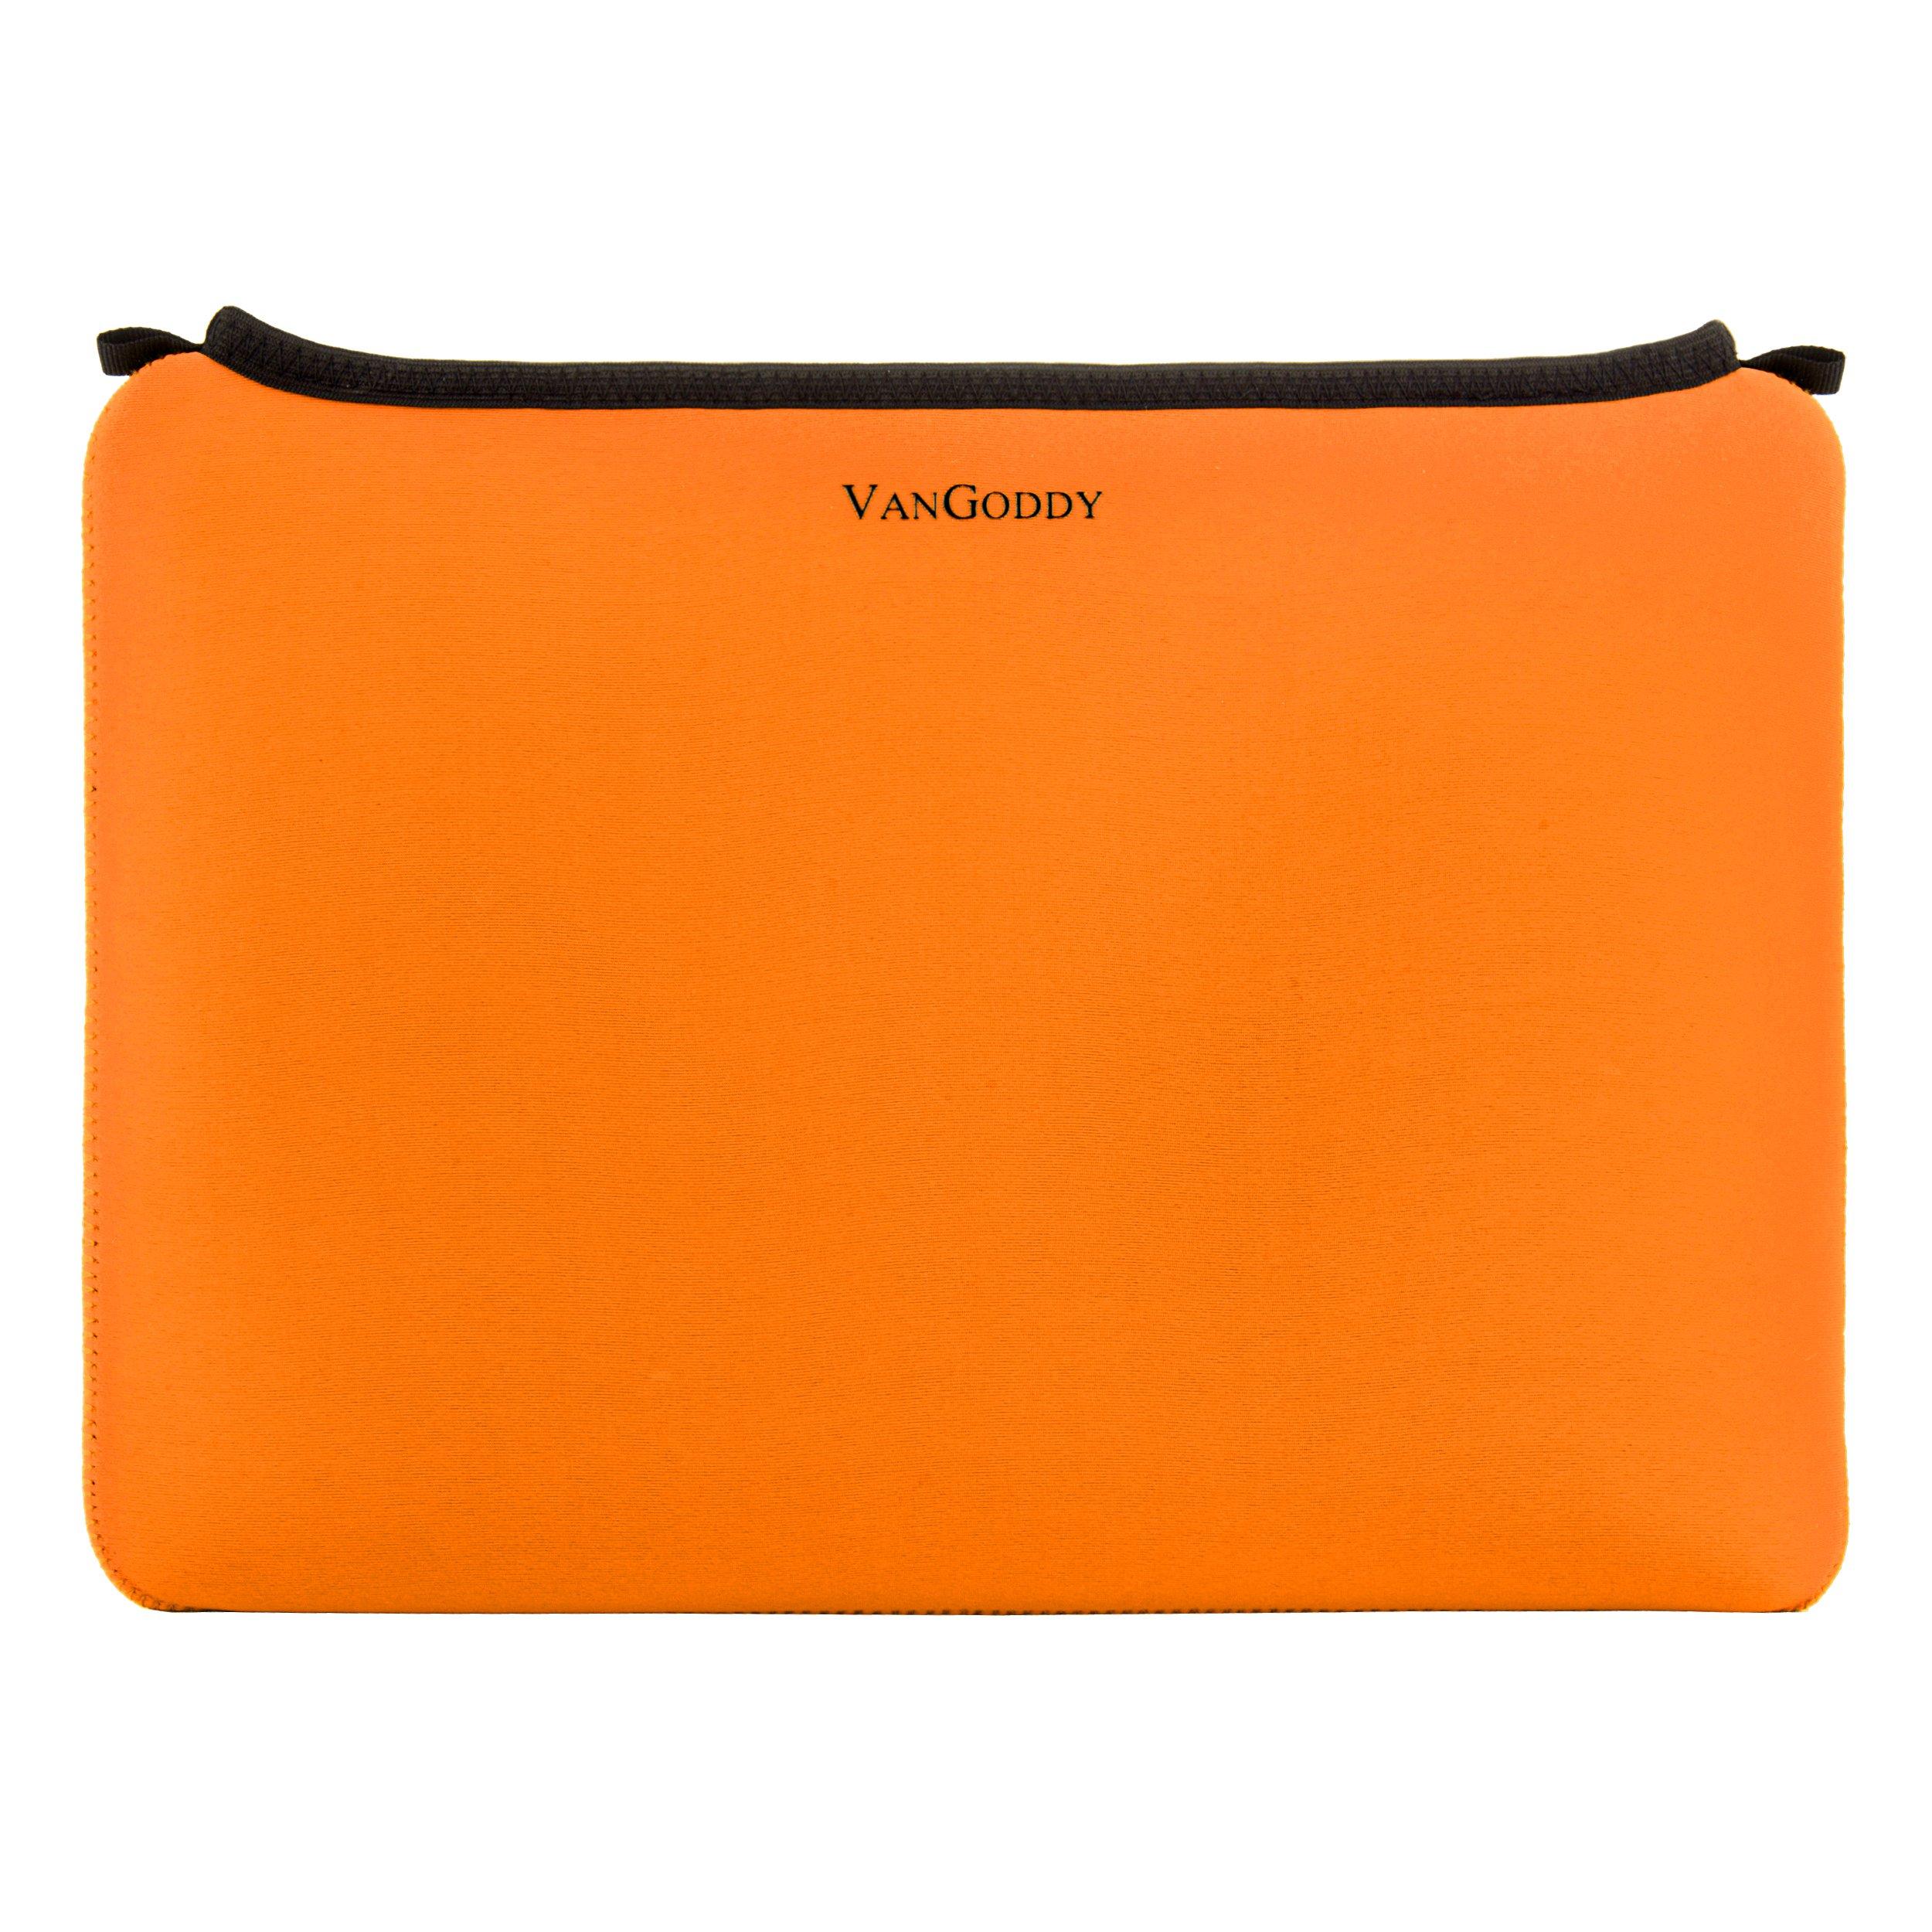 "Smart Sleeve for 14 - 14.1"" Laptops- Chromebook, Inspiron, Pavilion, Aspire, Alienware, Razer Blade, Flex, Vivobook, & Others"